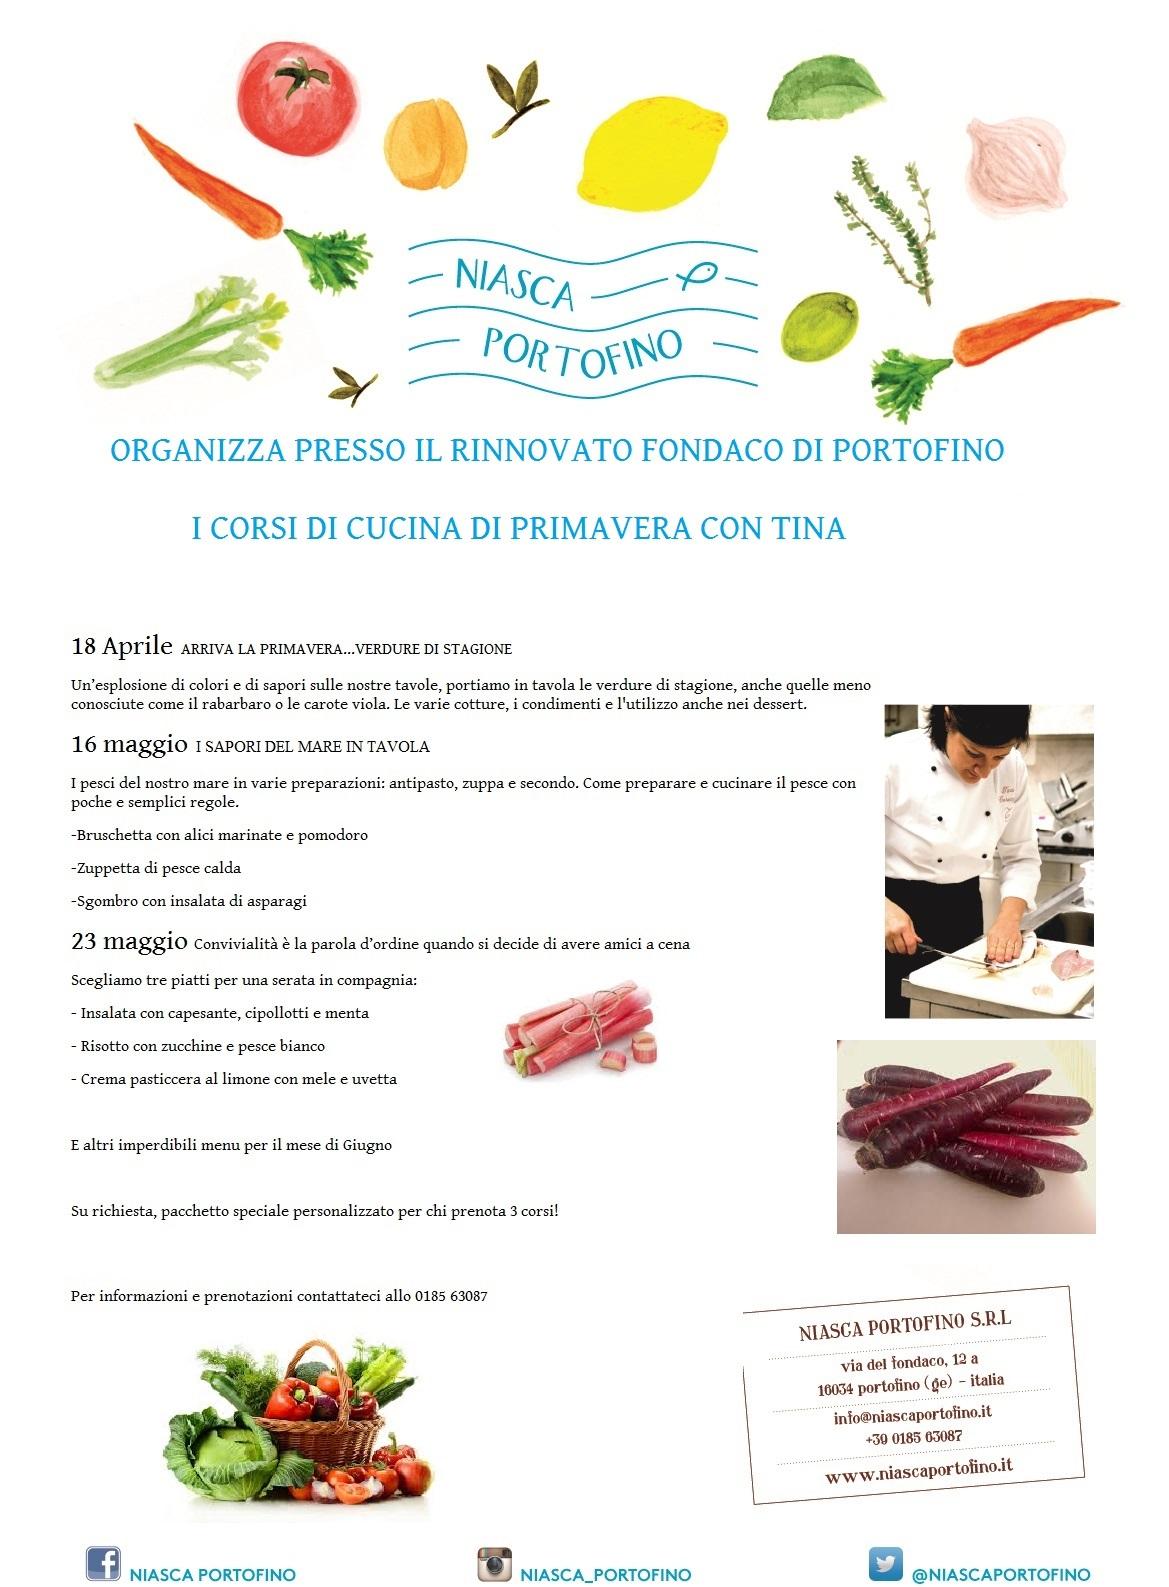 Corsi Di Cucina Con Tina Niasca Portofino